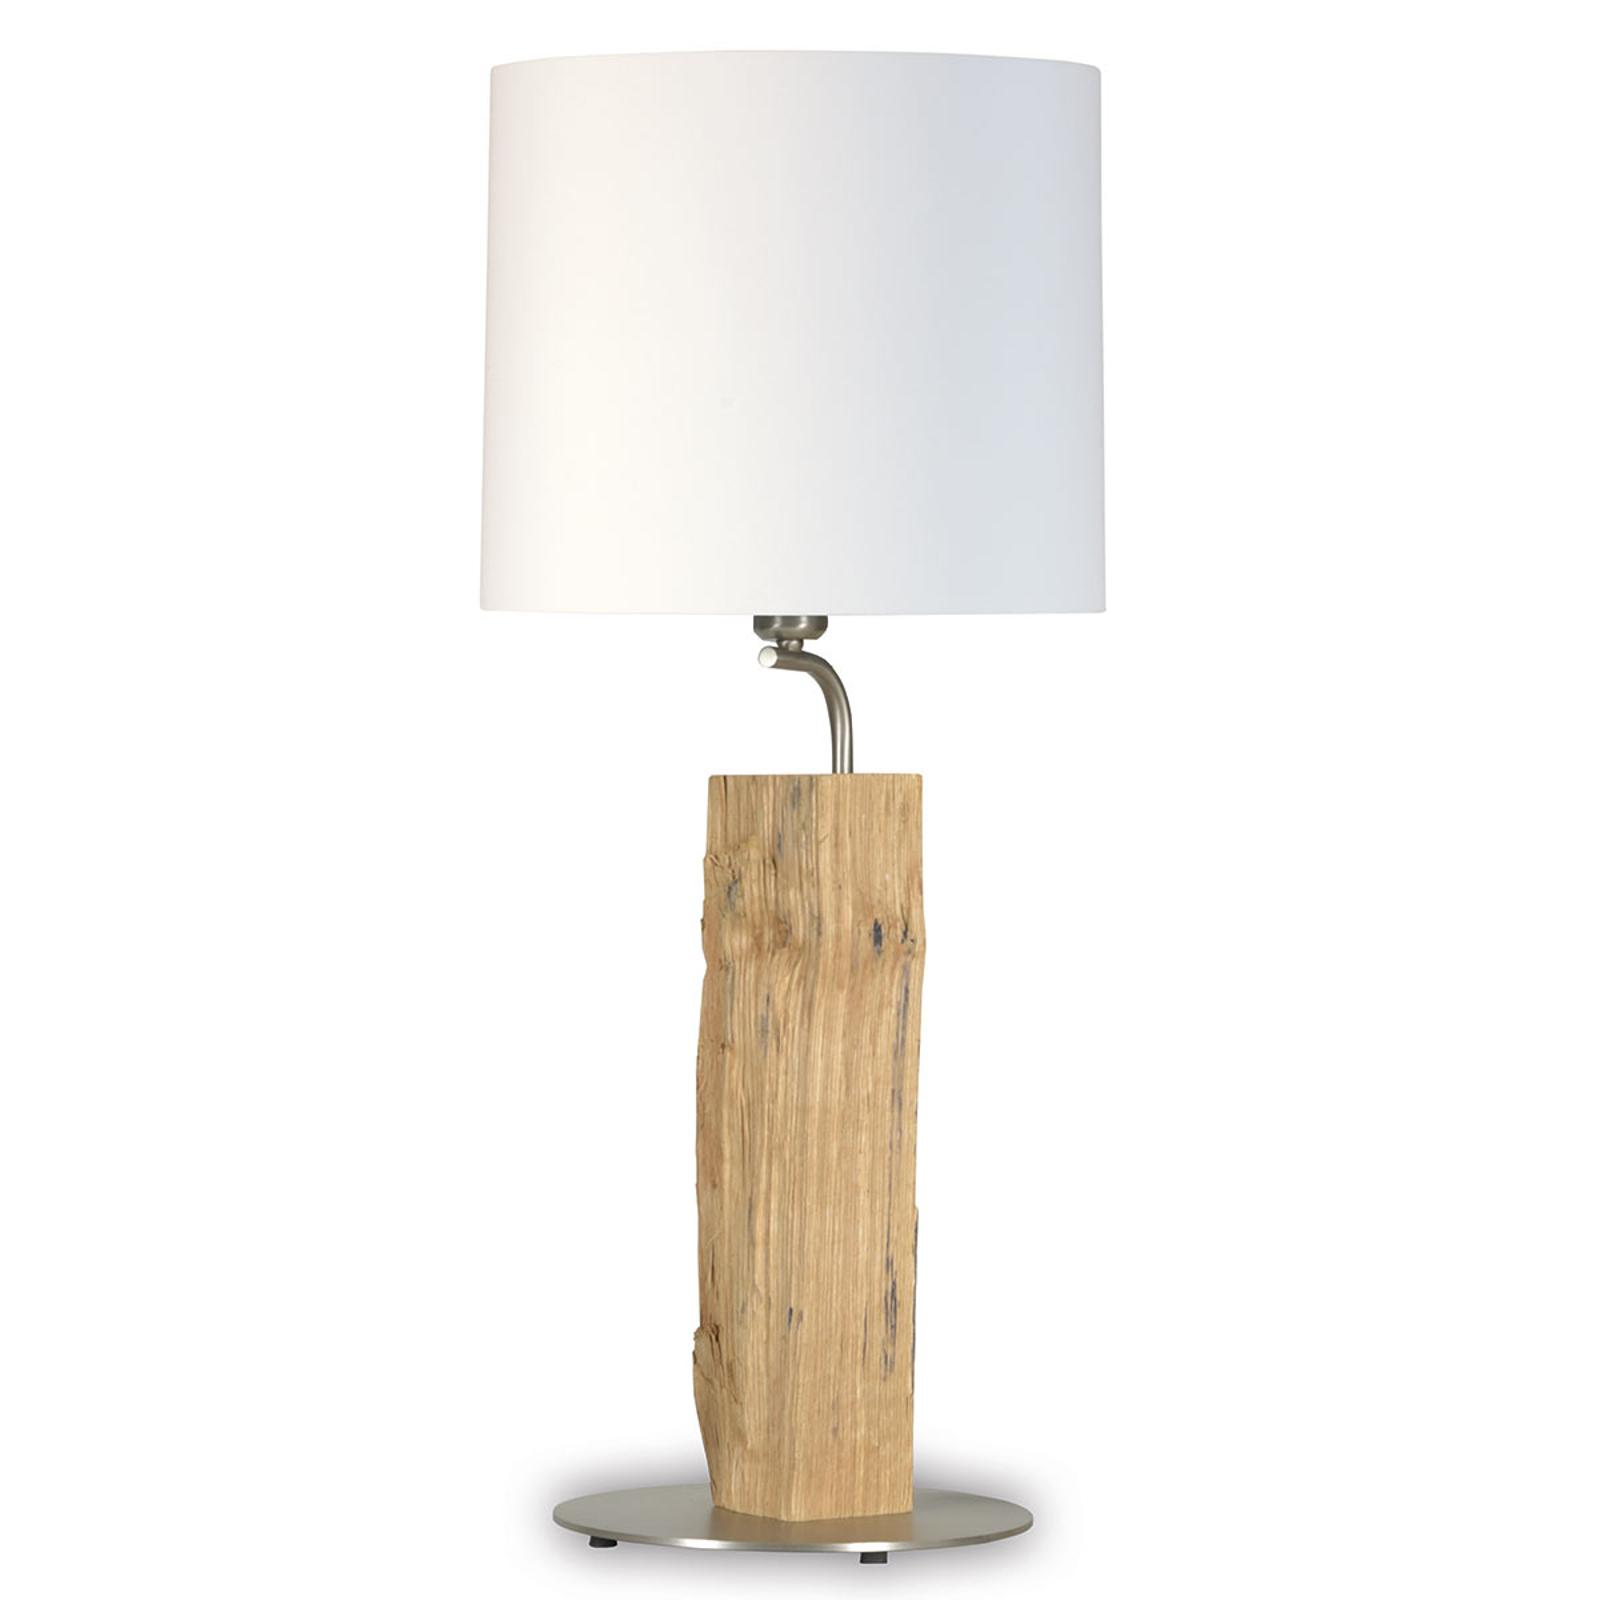 Neuer Kavalier tafellamp met houtelement, 71 cm